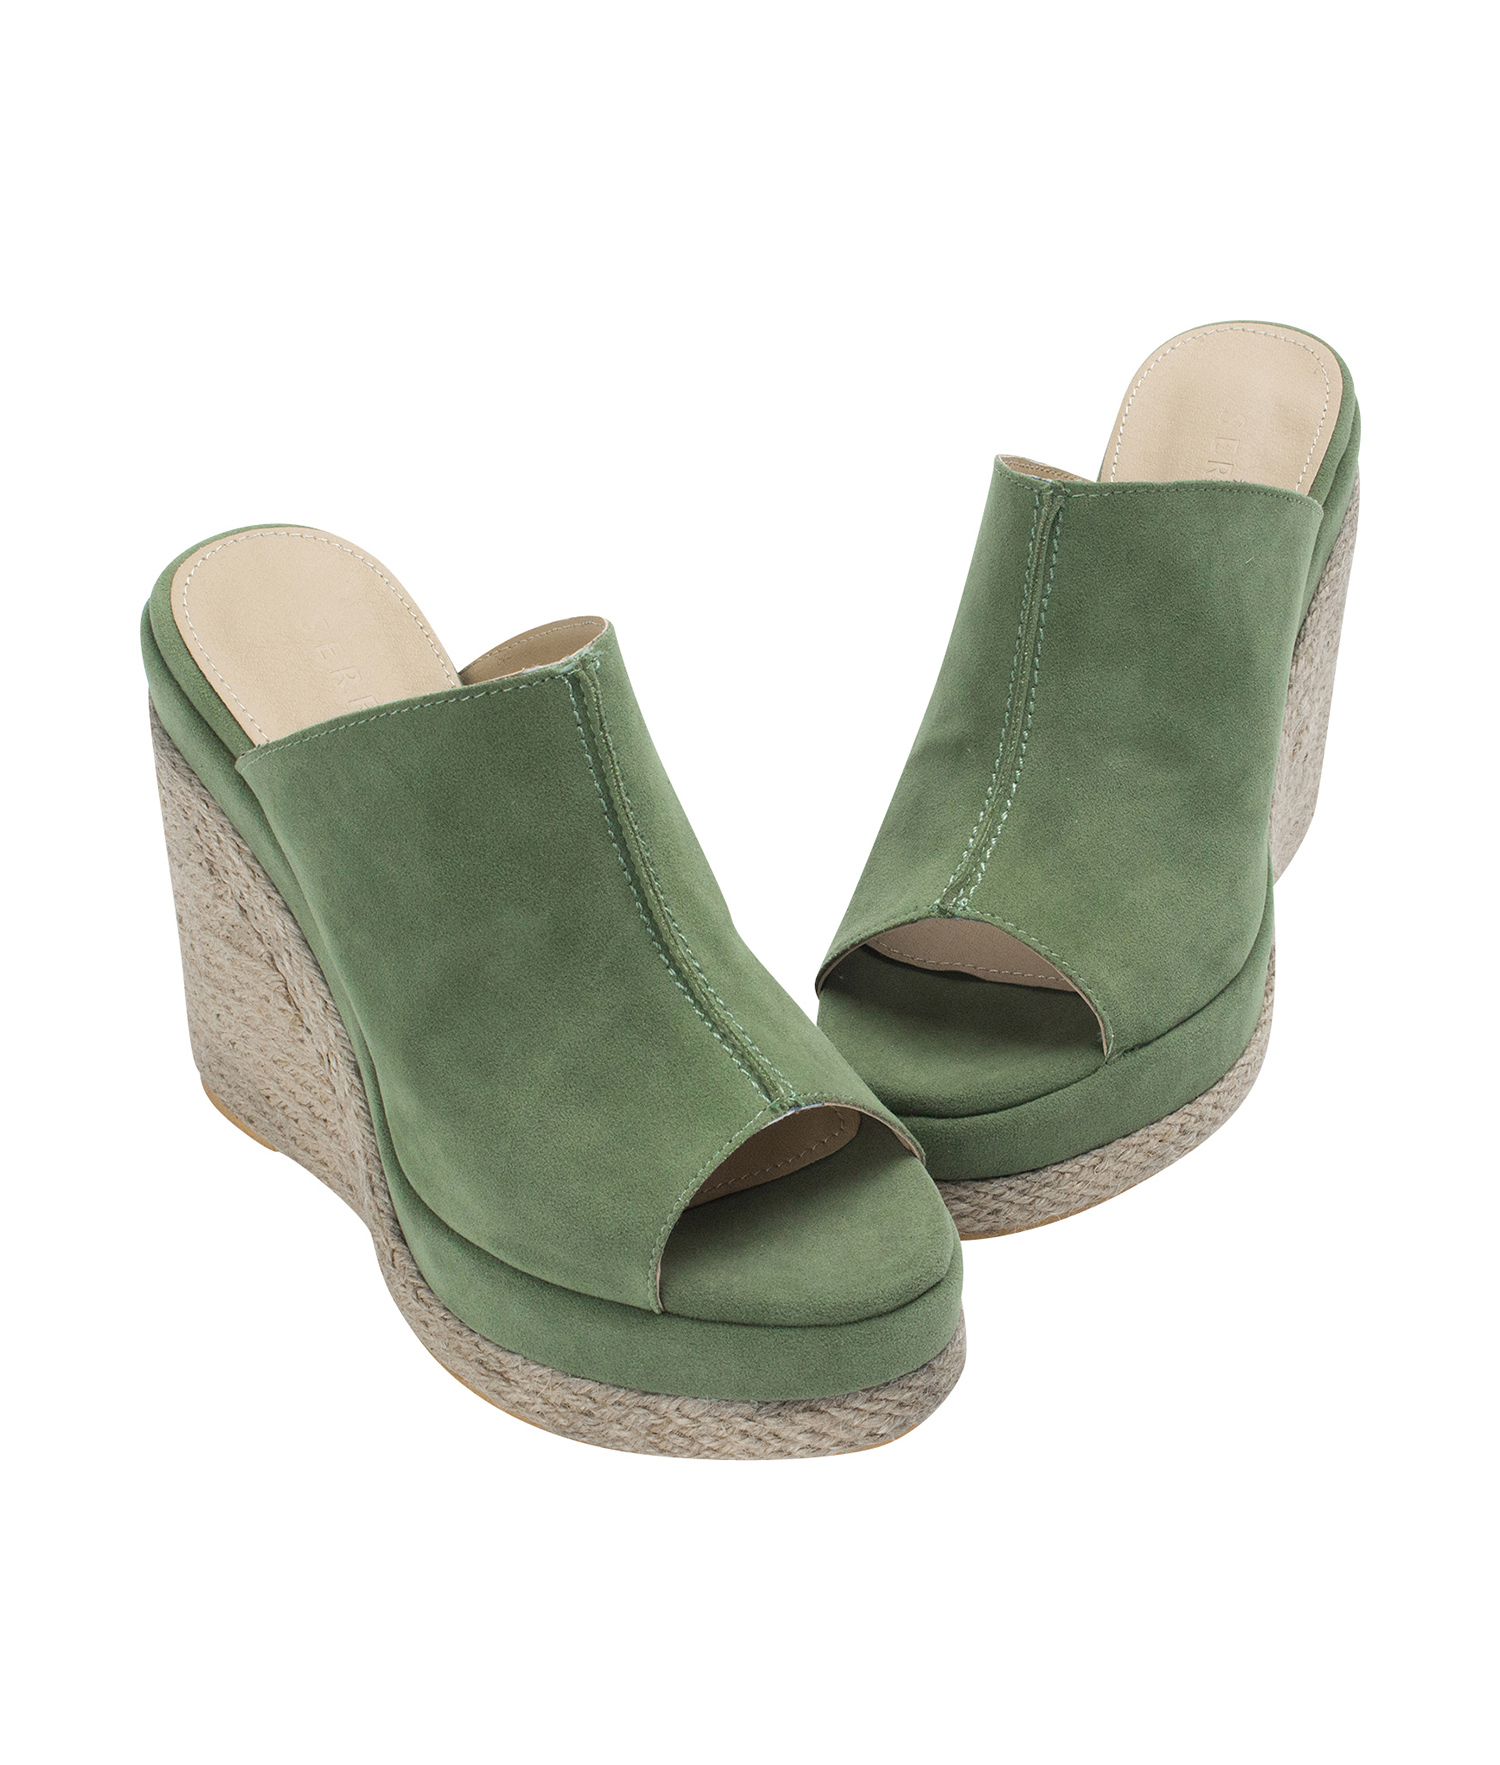 e83b24a5707a Annakastle Womens Faux Suede Espadrille Wedge Mule Sandals Pale Green